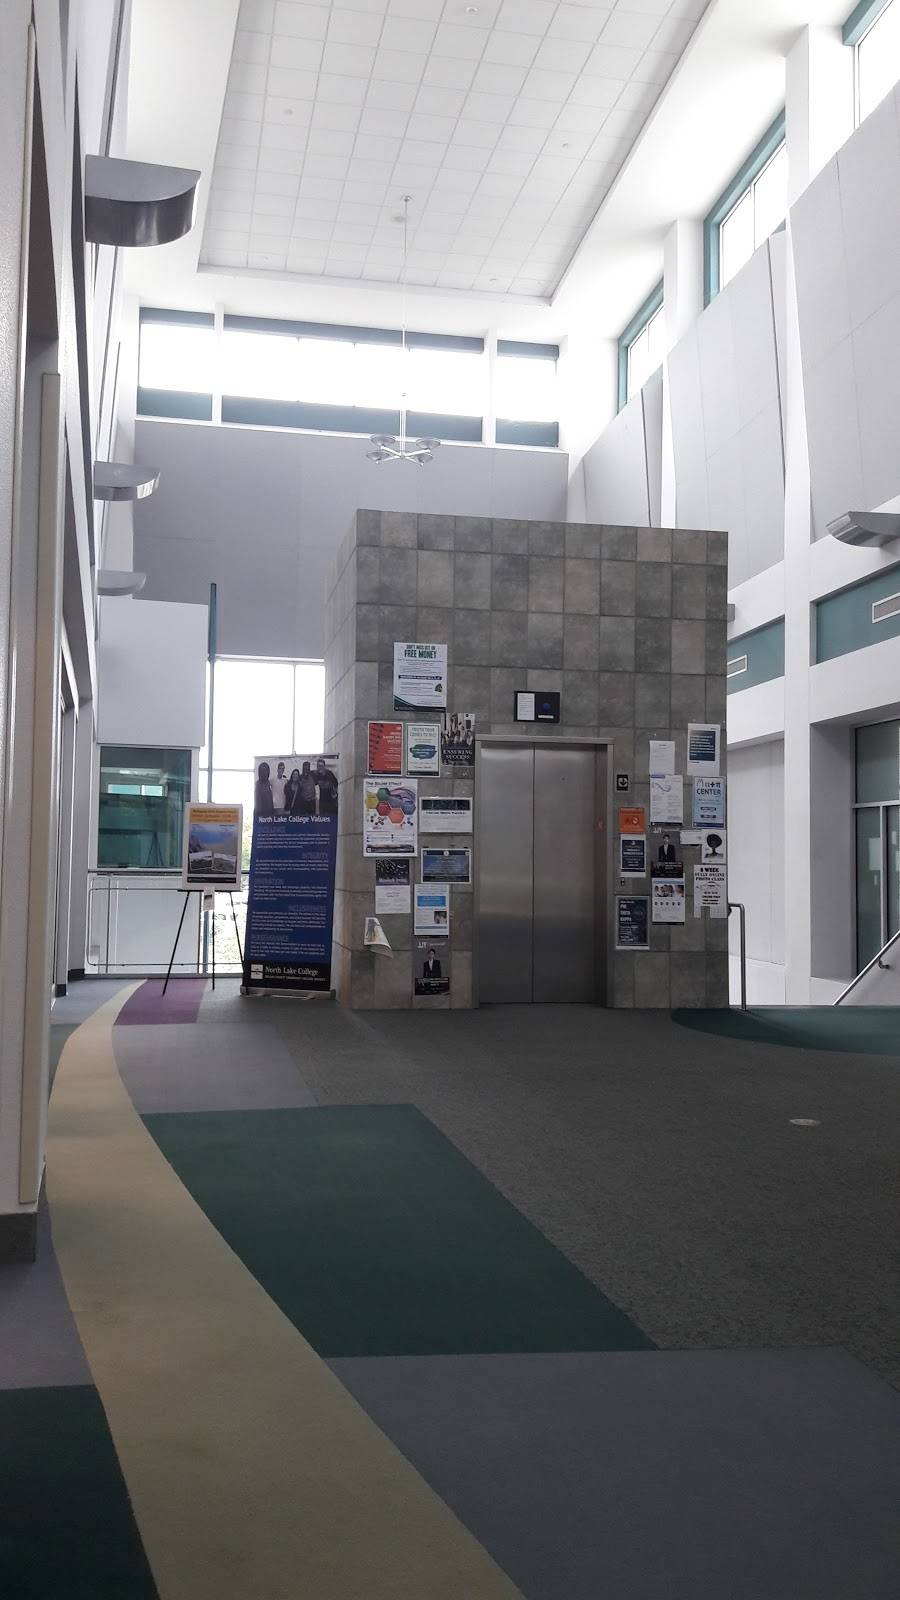 North Lake Community Library - library  | Photo 4 of 10 | Address: 5001 N MacArthur Blvd, Irving, TX 75038, USA | Phone: (972) 273-3400